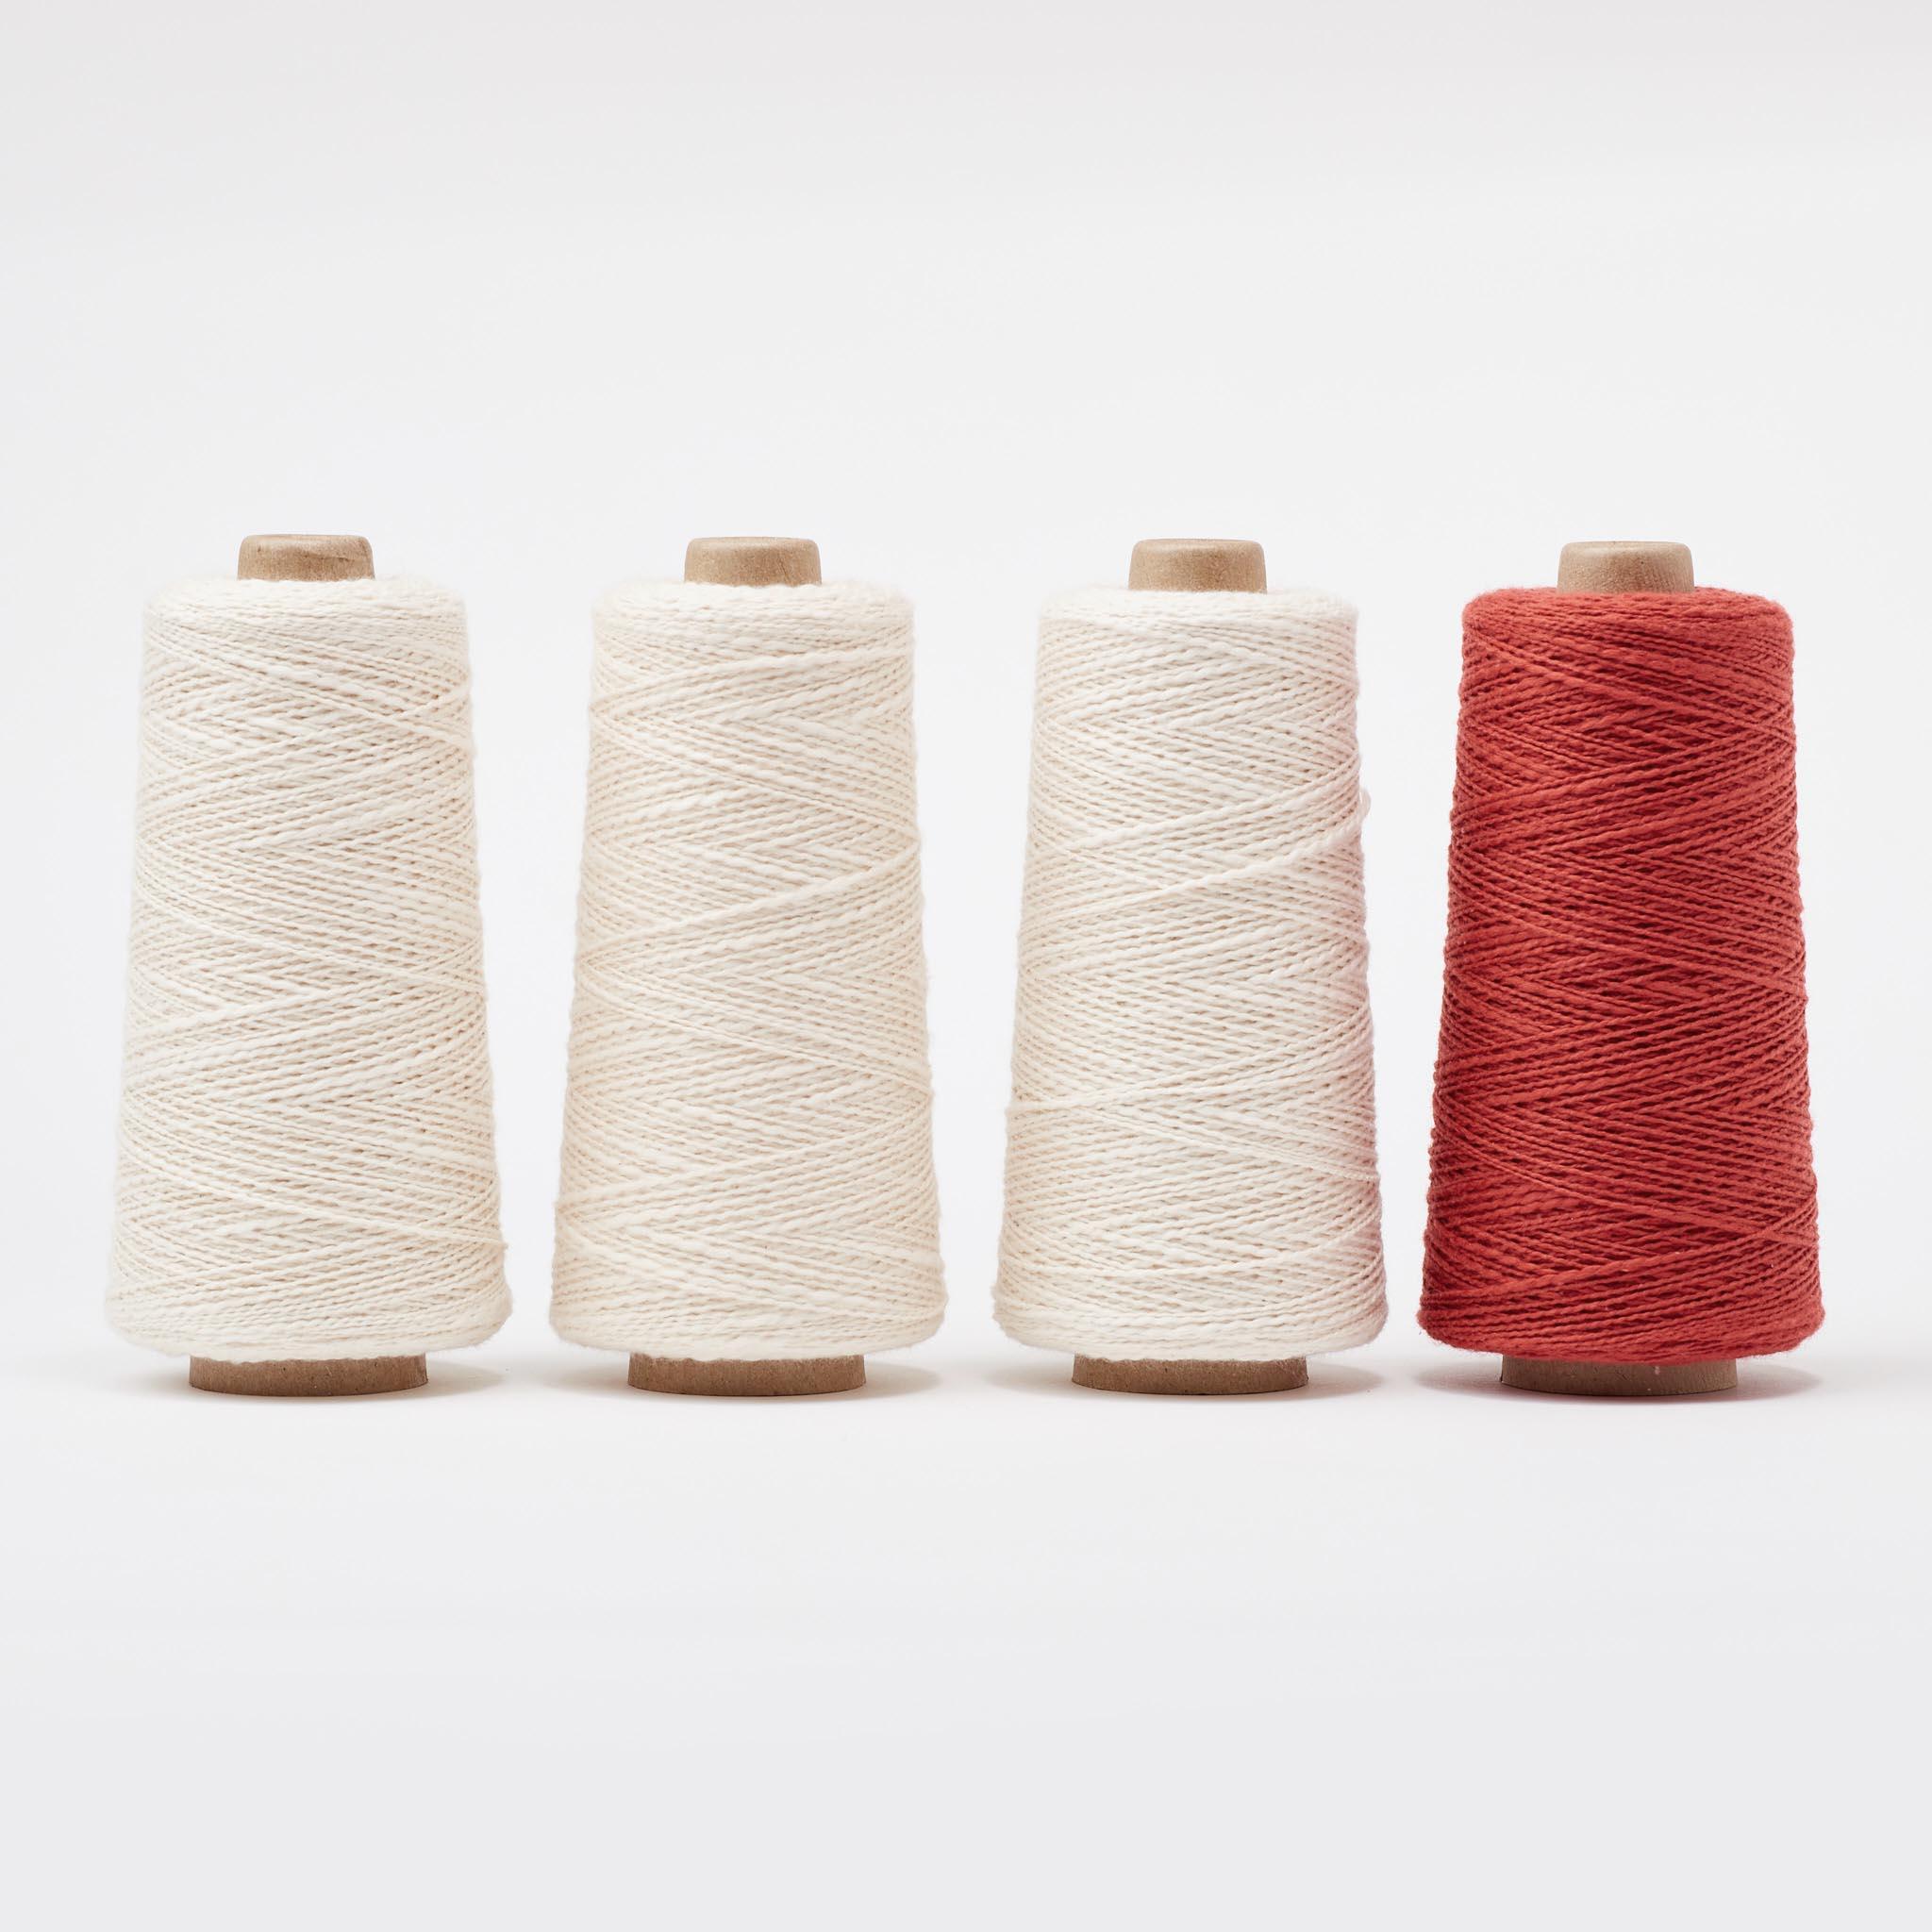 Free Weaving Pattern Droppdräll Towel by Arianna Funk